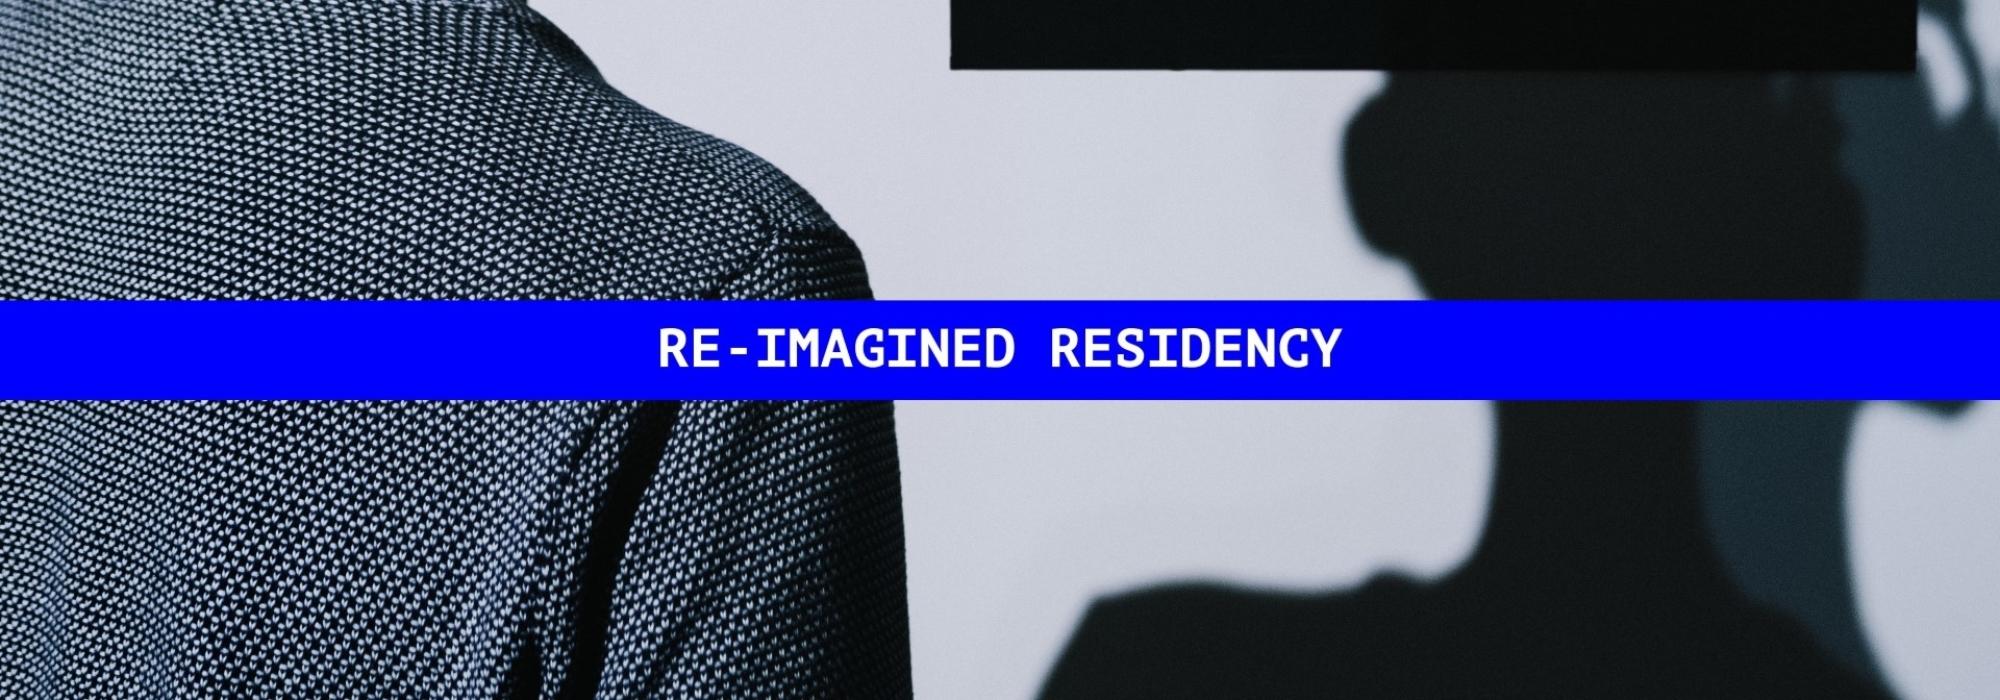 Re-Imagined Residency: William Fairbrother & Alberto Ruiz Soler